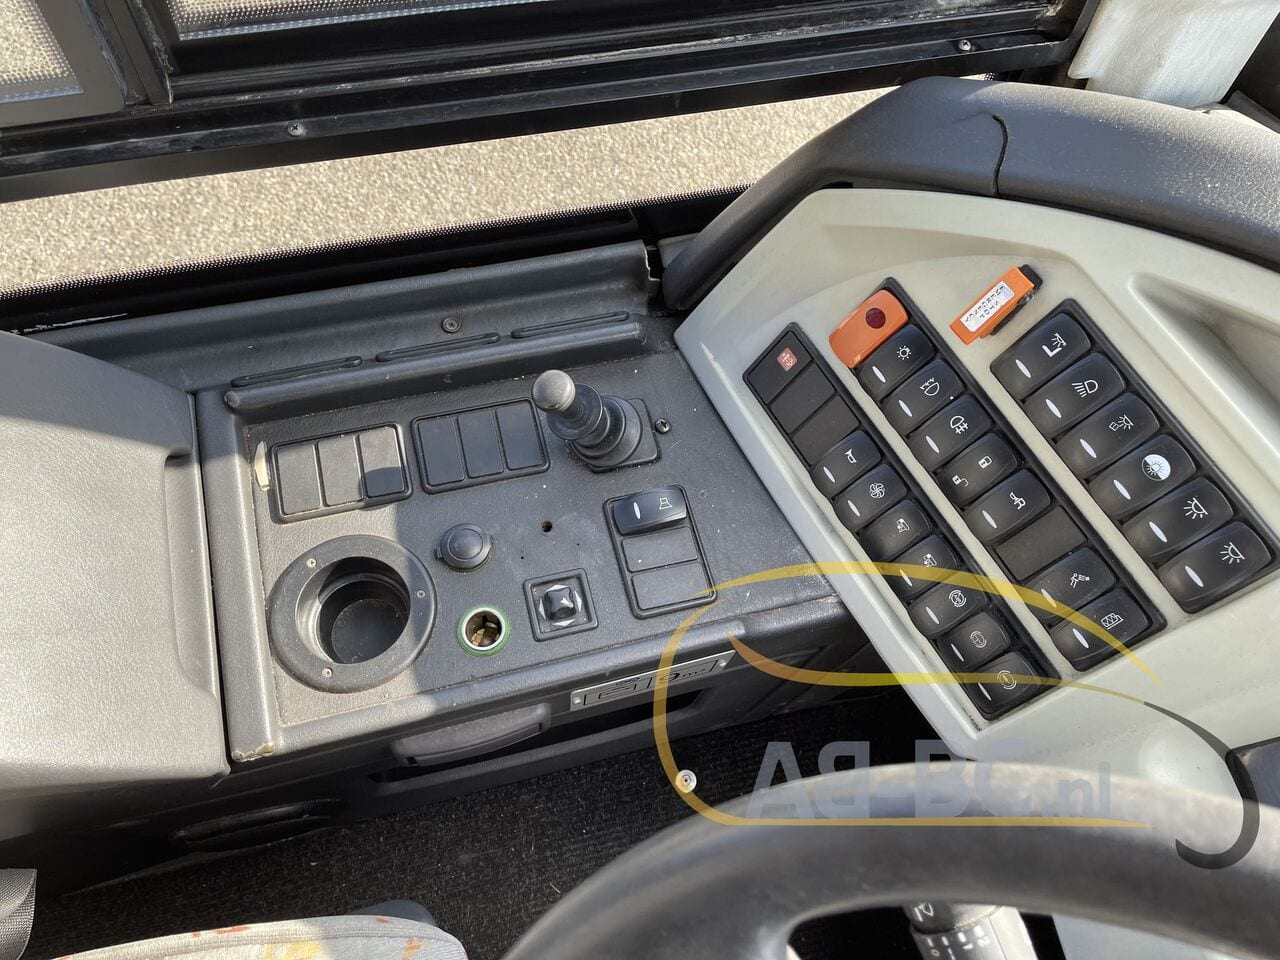 coach-busTEMSA-Safari-RD-53-Seats-DAF-Motor-12-mtr---1616166743139803318_big_5b60e980b38b7203dc51f90989925eb8--21031917053743807500